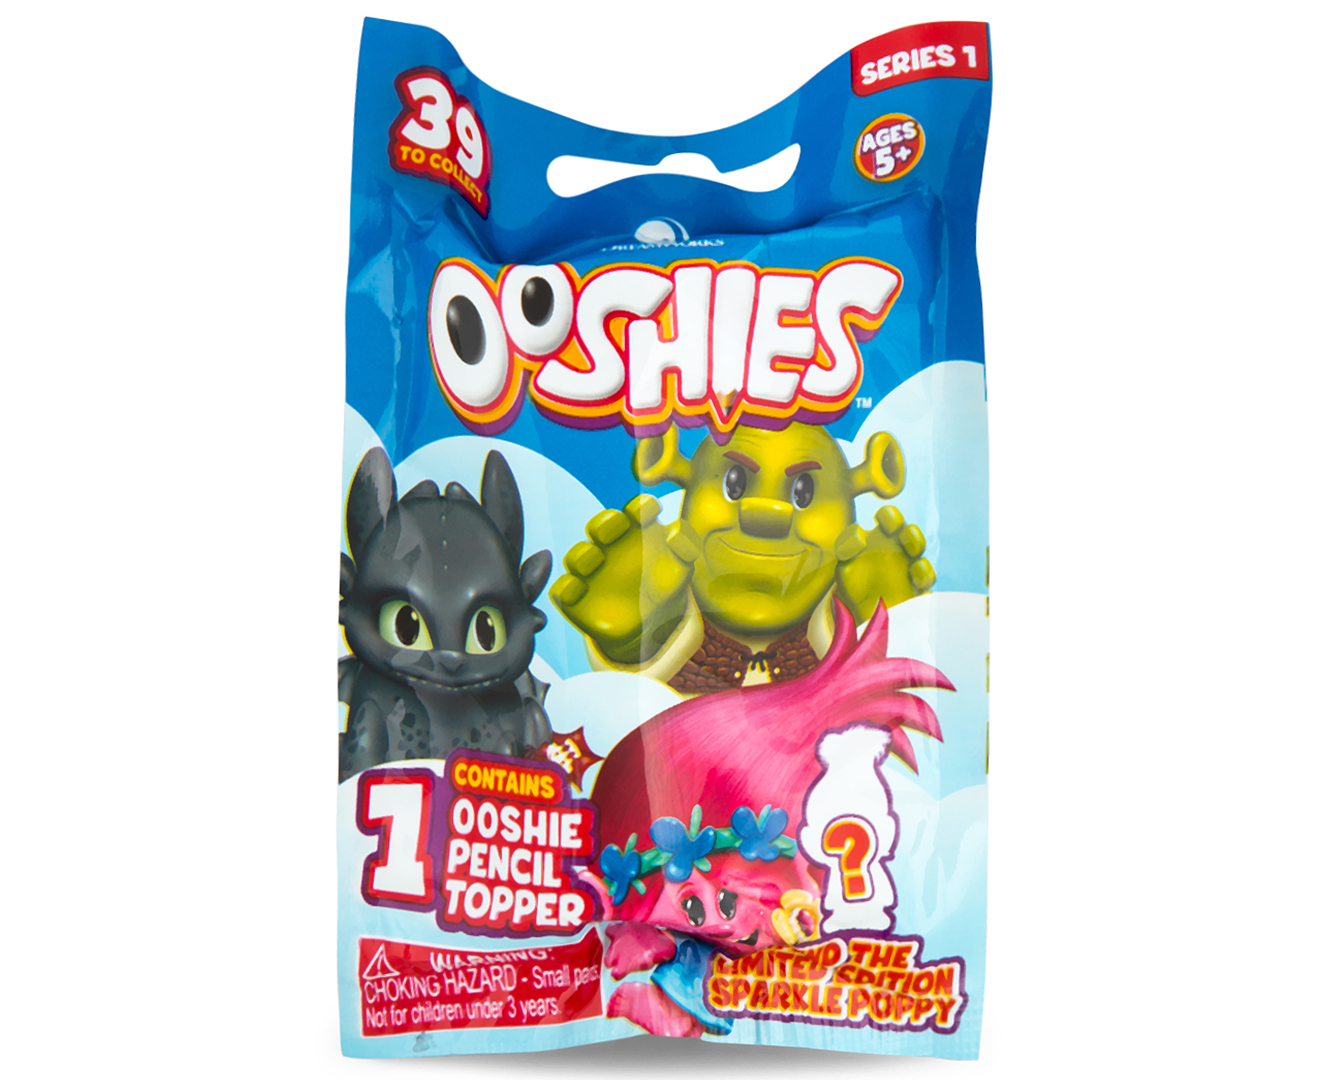 OOSHIES DREAMWORKS PENCIL TOPPER TROLLS SHREK /& MORE 2 RANDOM BLIND BAGS